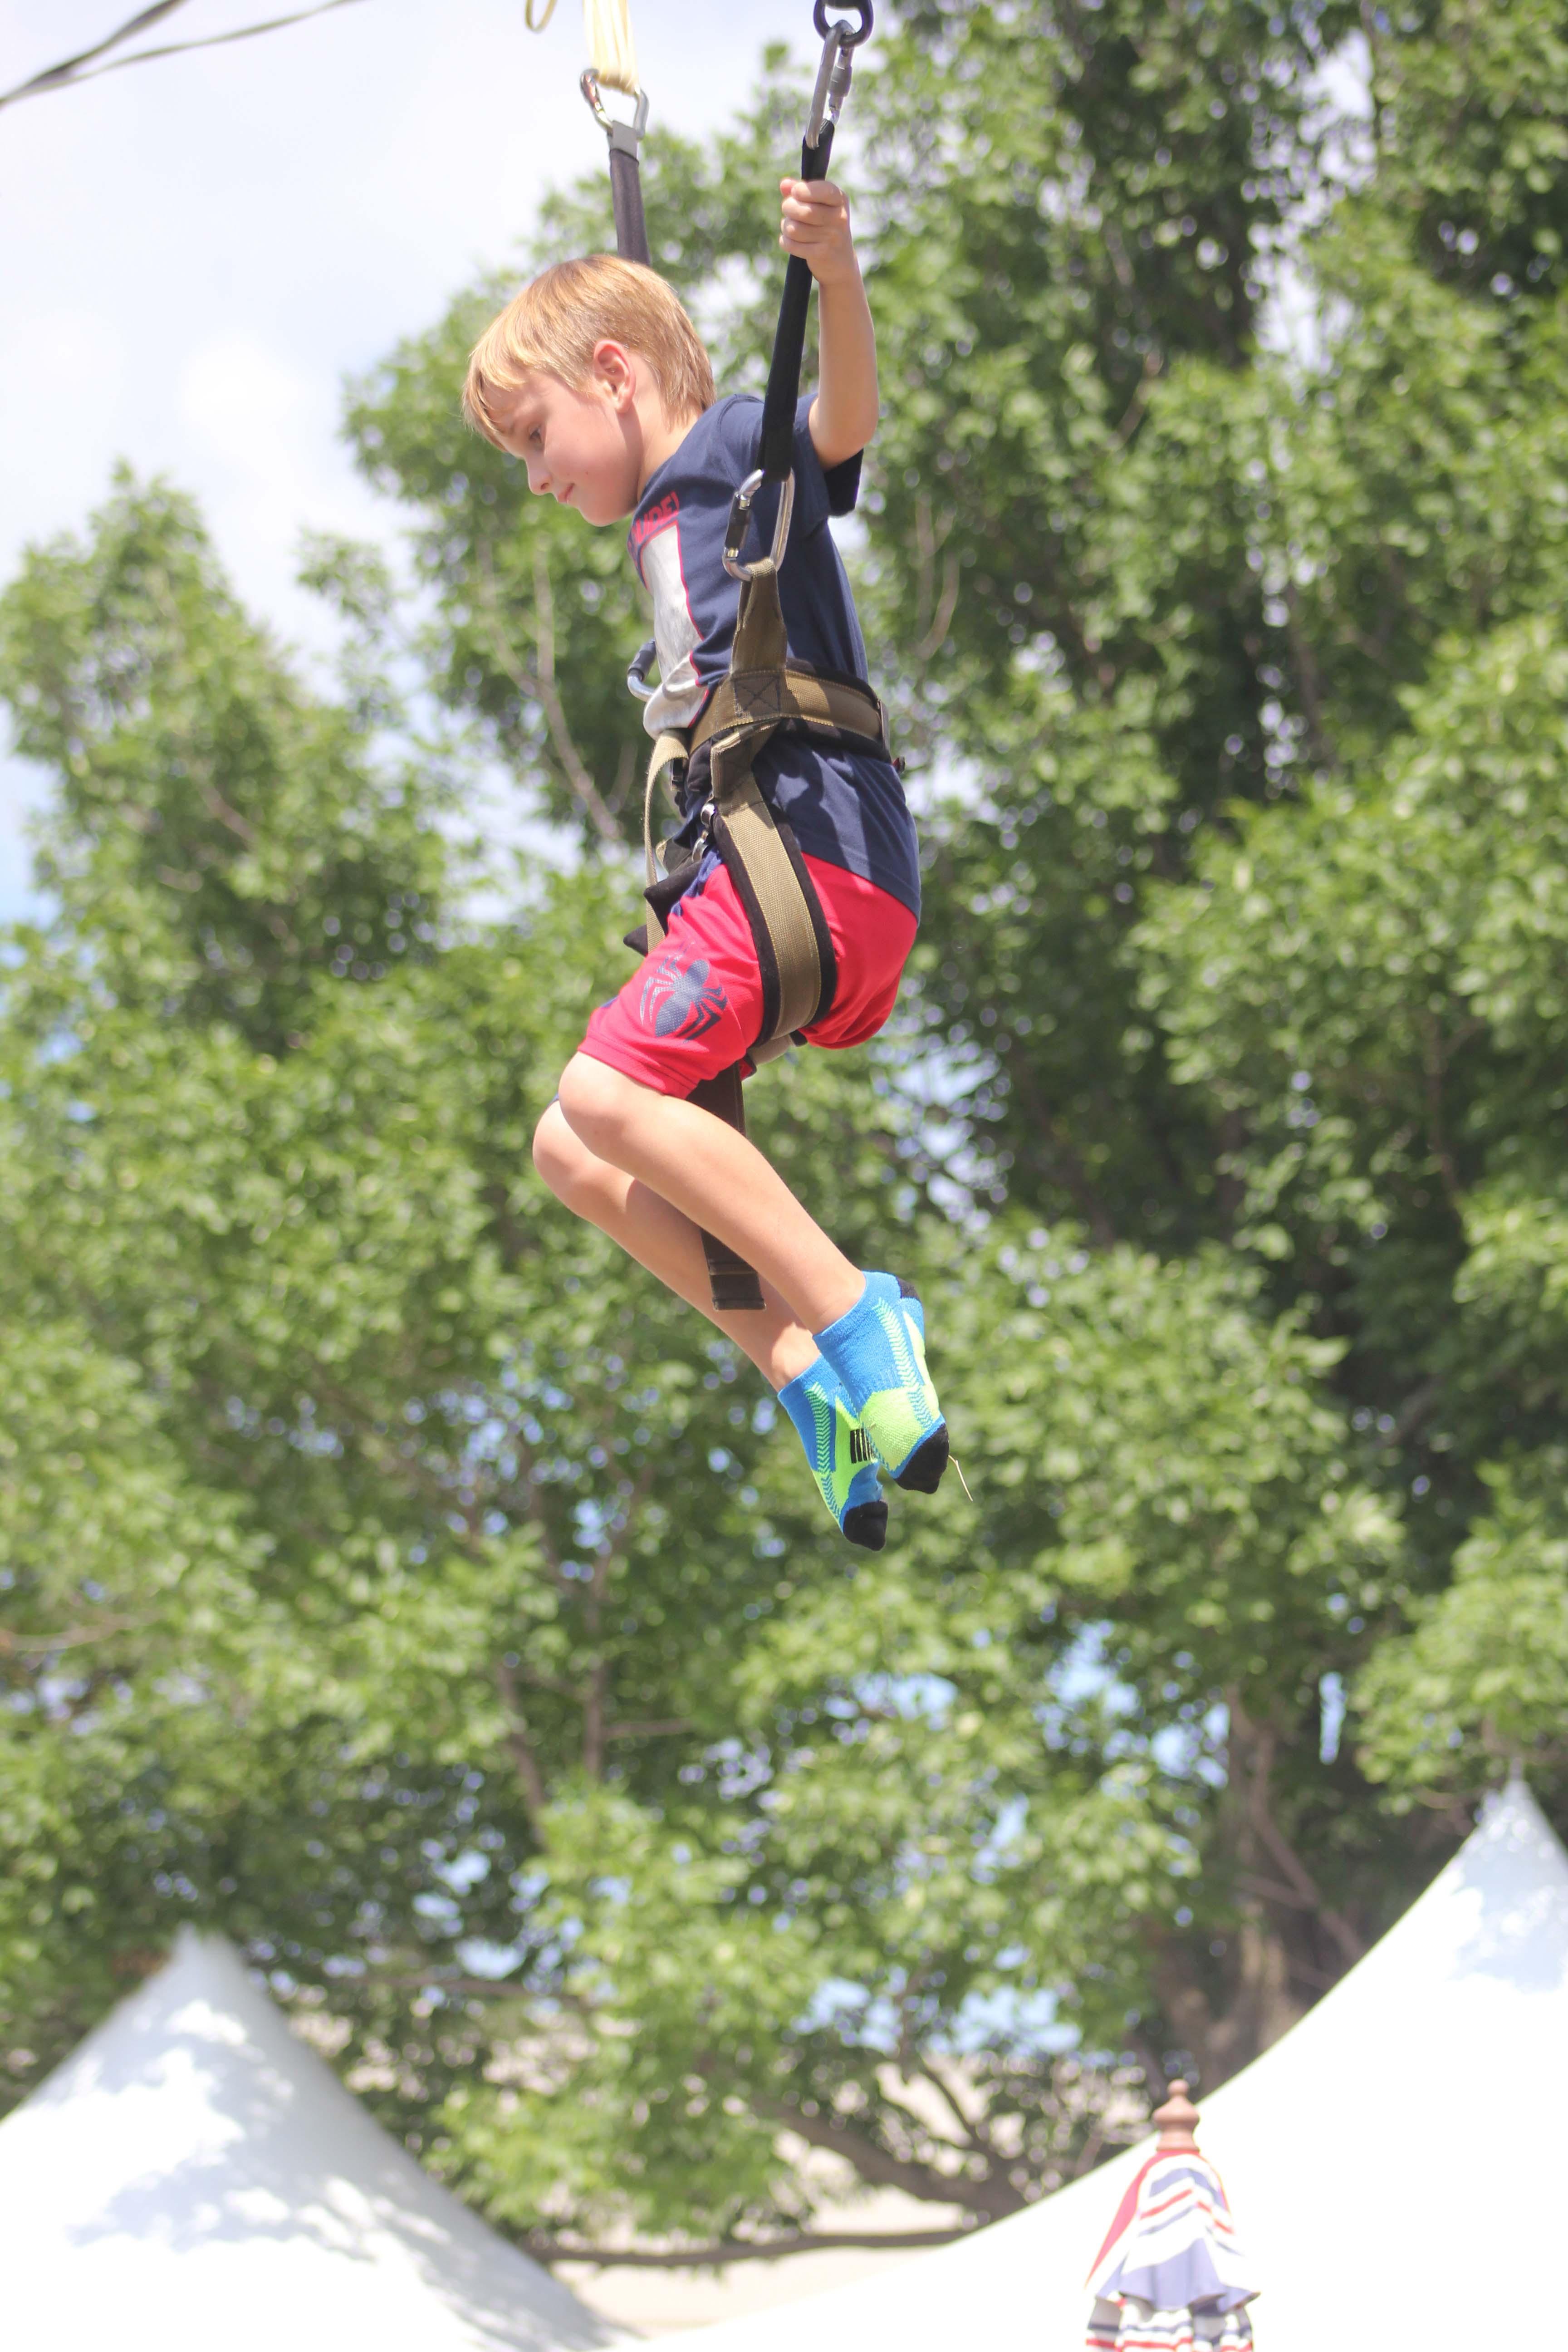 Gabe Hooten of Dallas, Tex. enjoys the bungee ride at the fair.